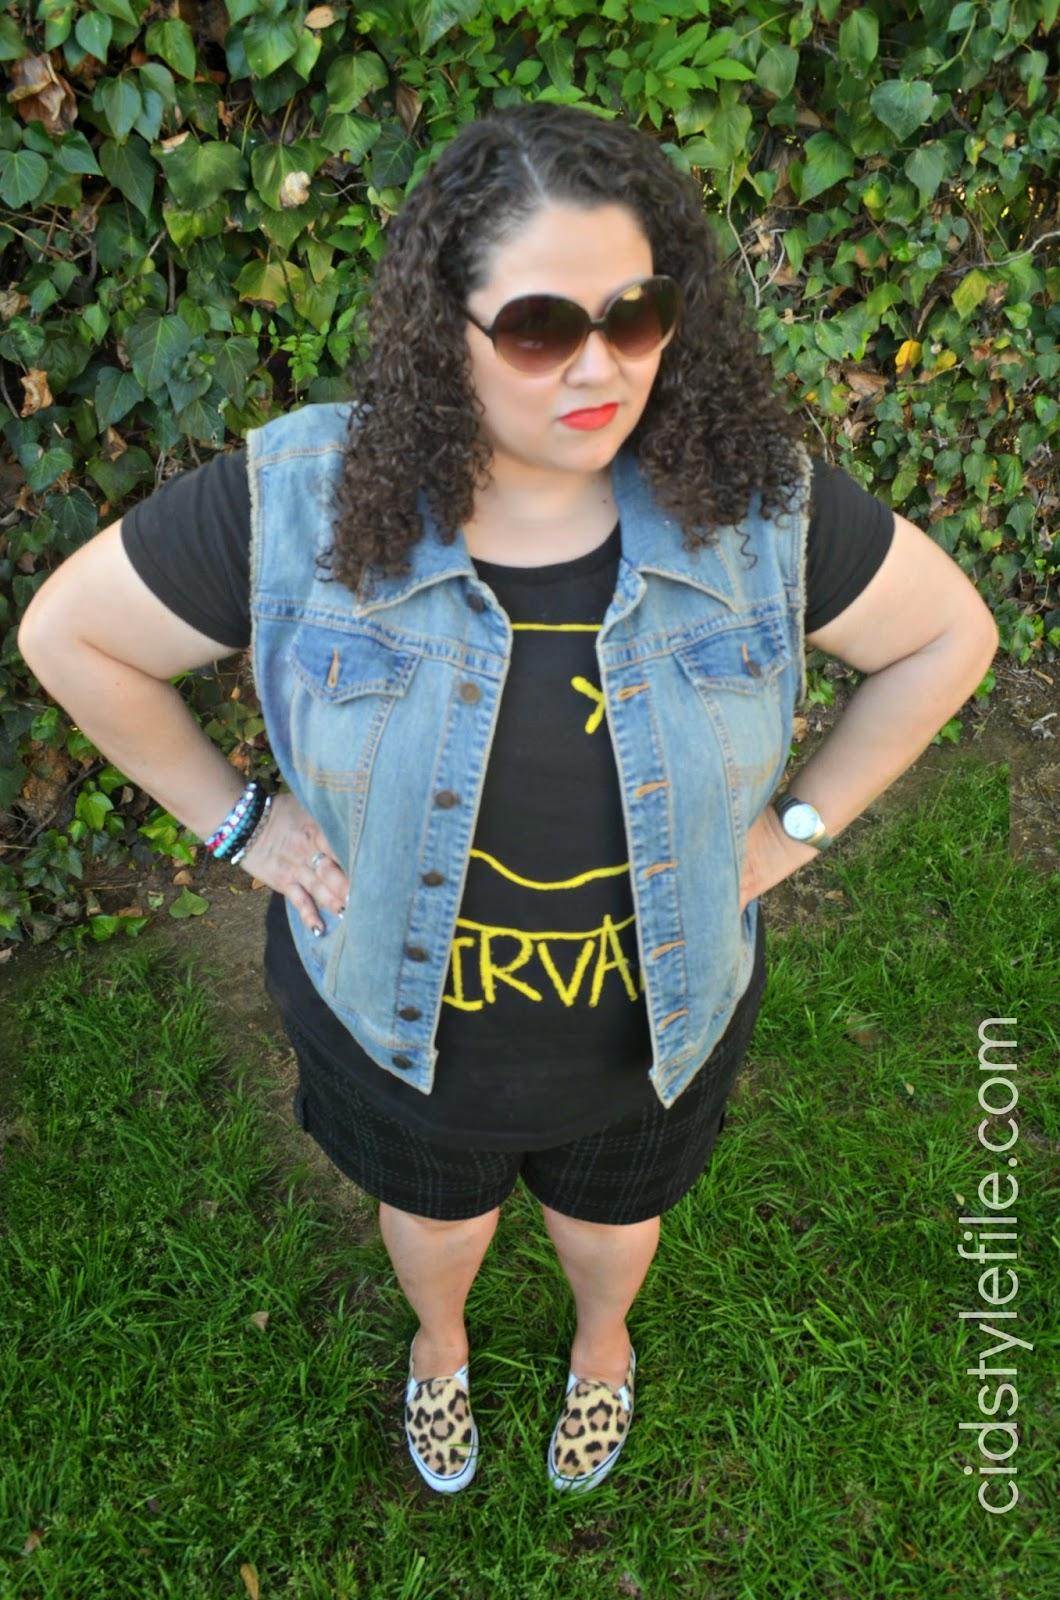 plus size fashion, tshirt, rock tee, nirvana, nevermind, denim vest, plus size blogger, leopard slipons,